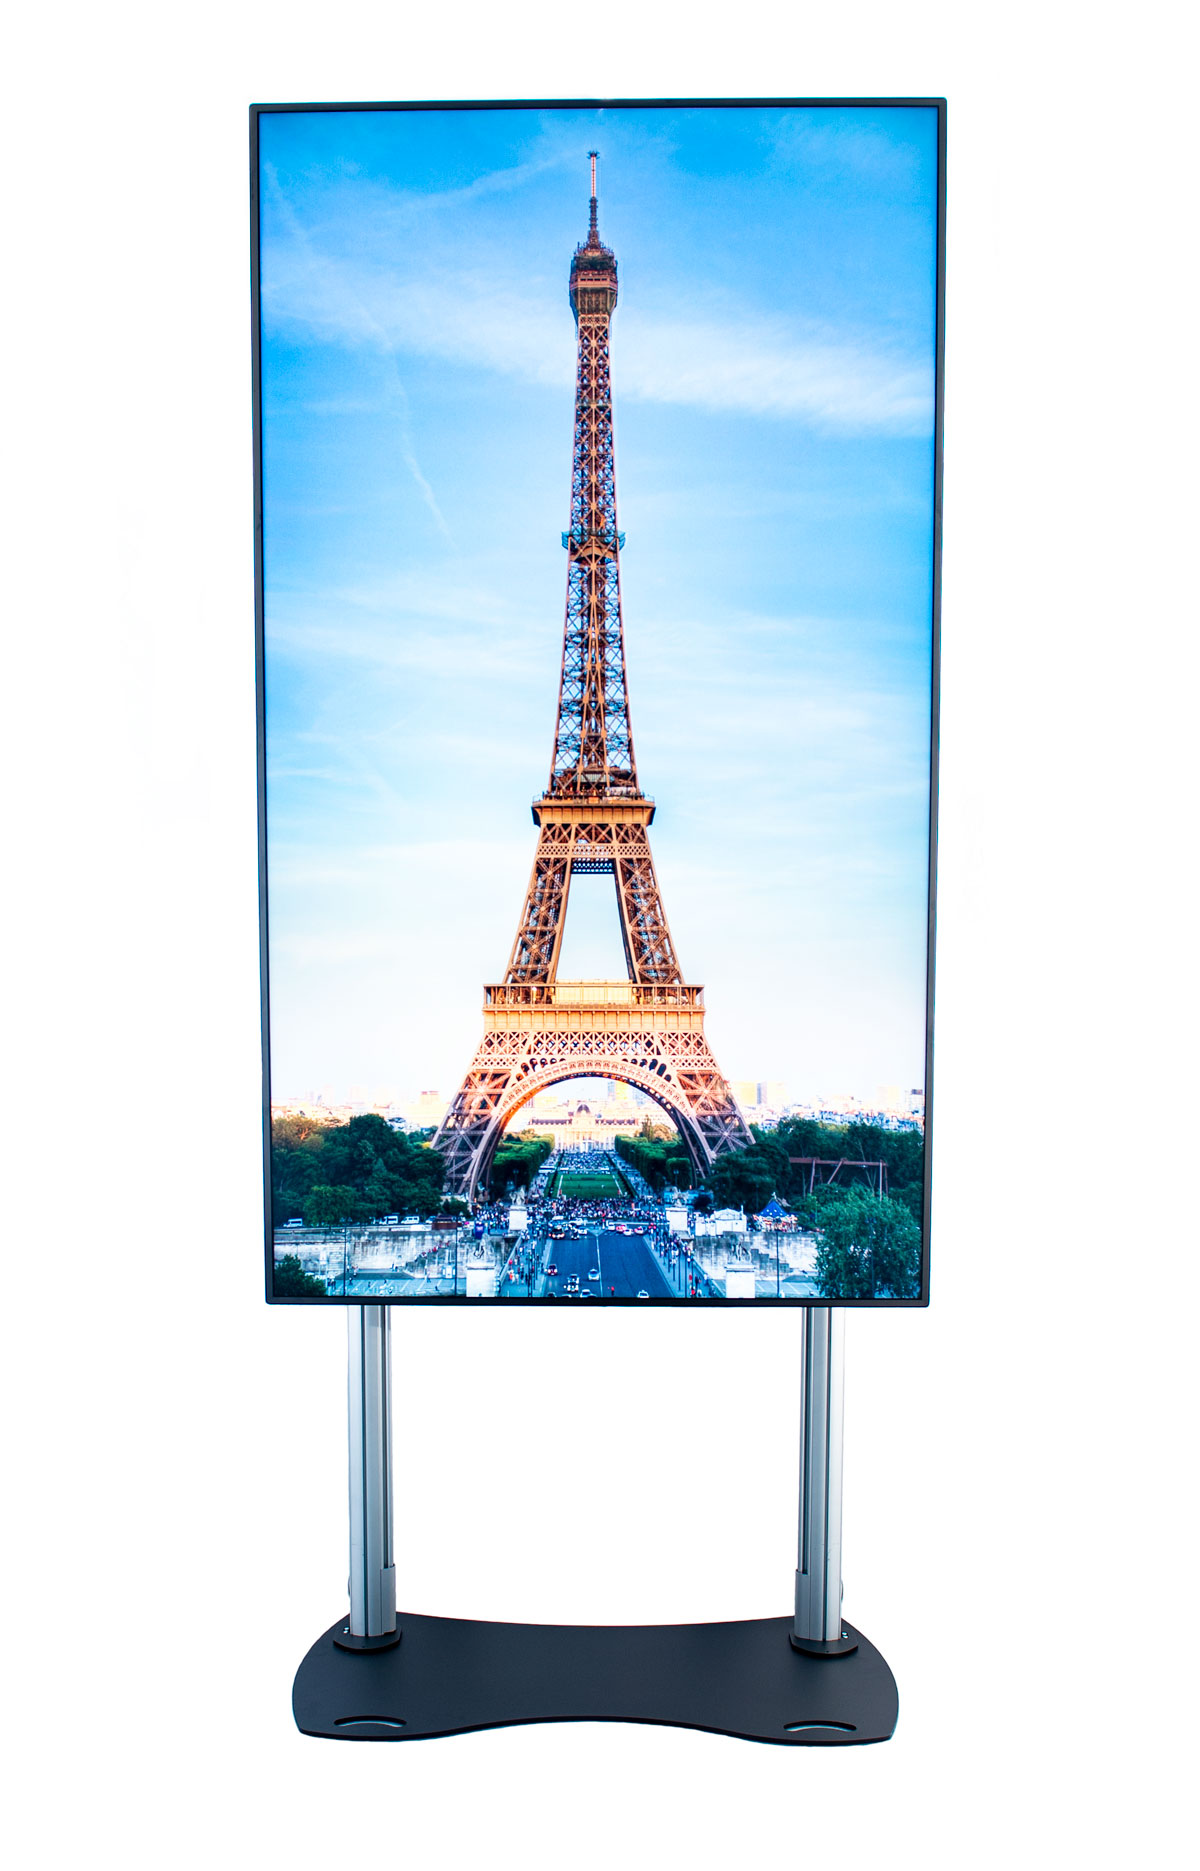 Samsung 98 Inch QM98F UHD SMART Signage TV Display Hire